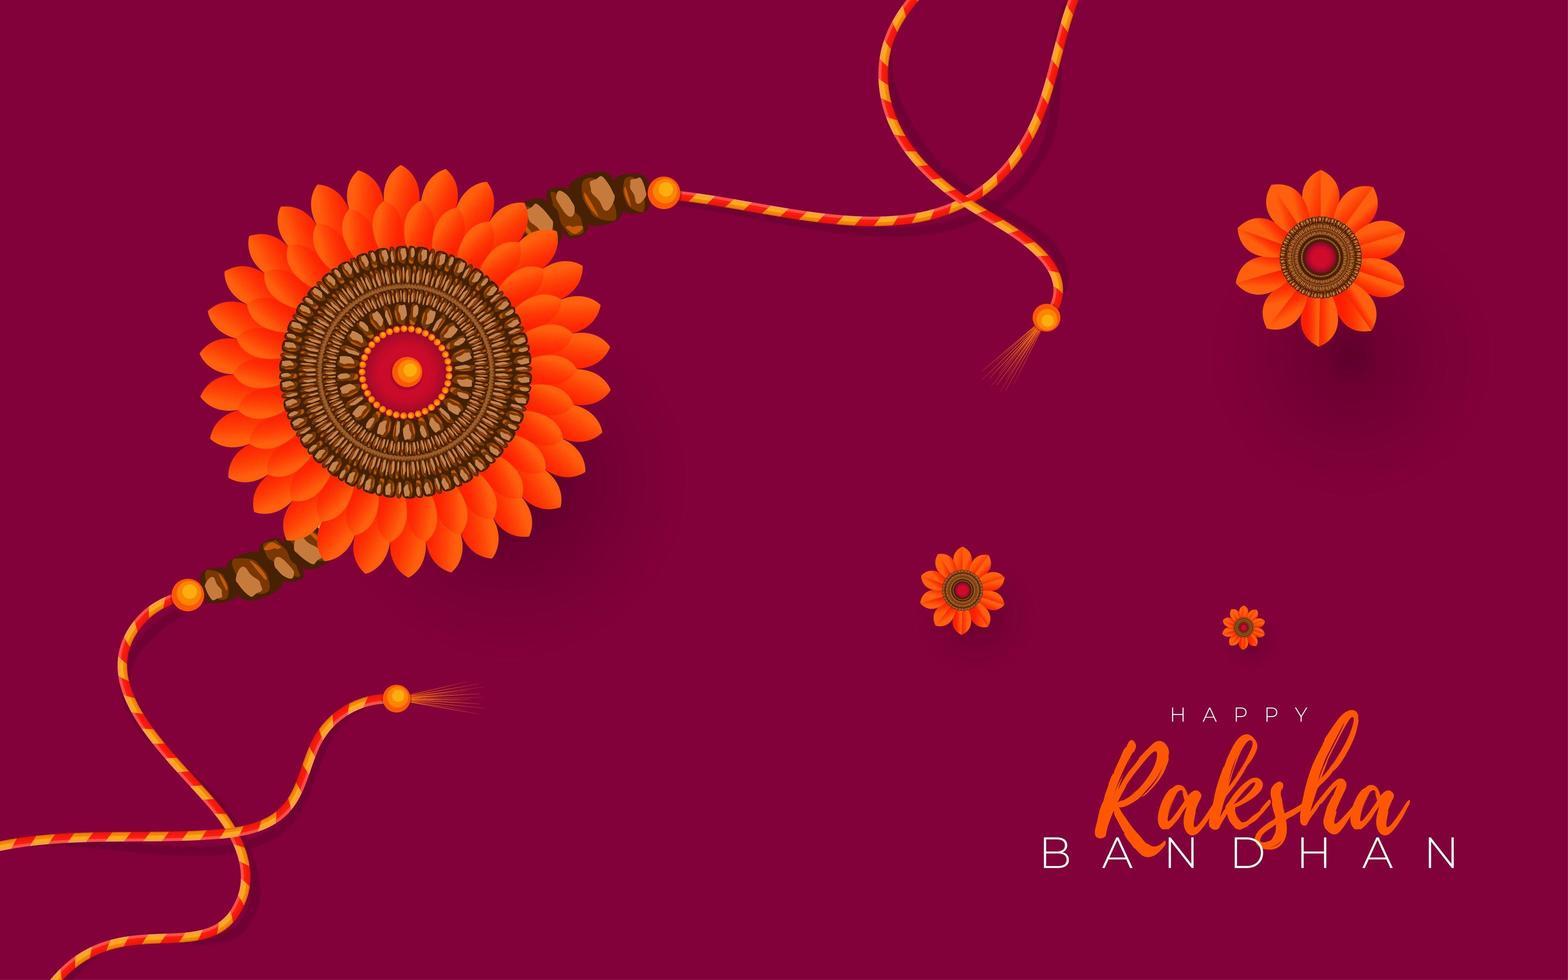 diseño feliz de raksha bandhan vector